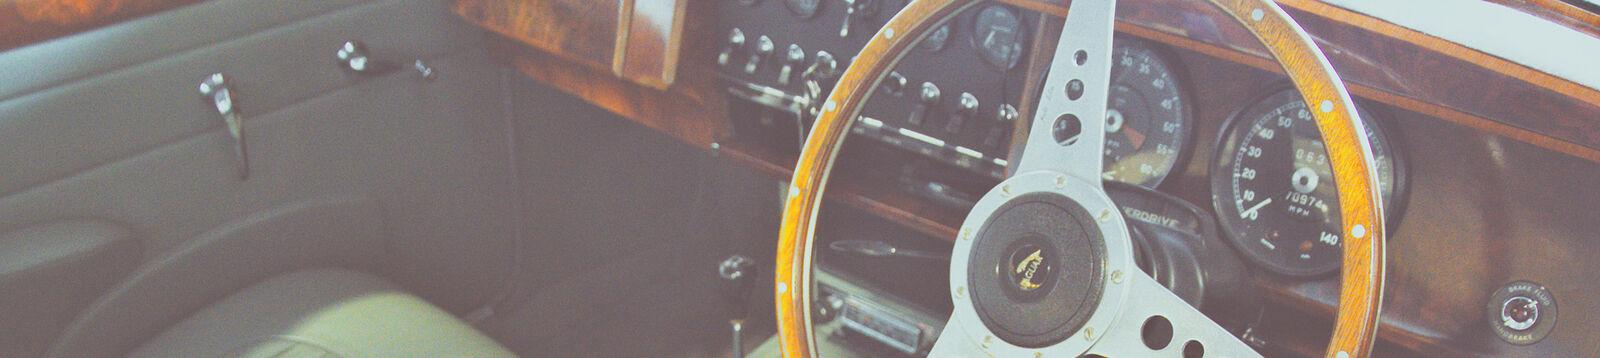 Classic Car Automobilia